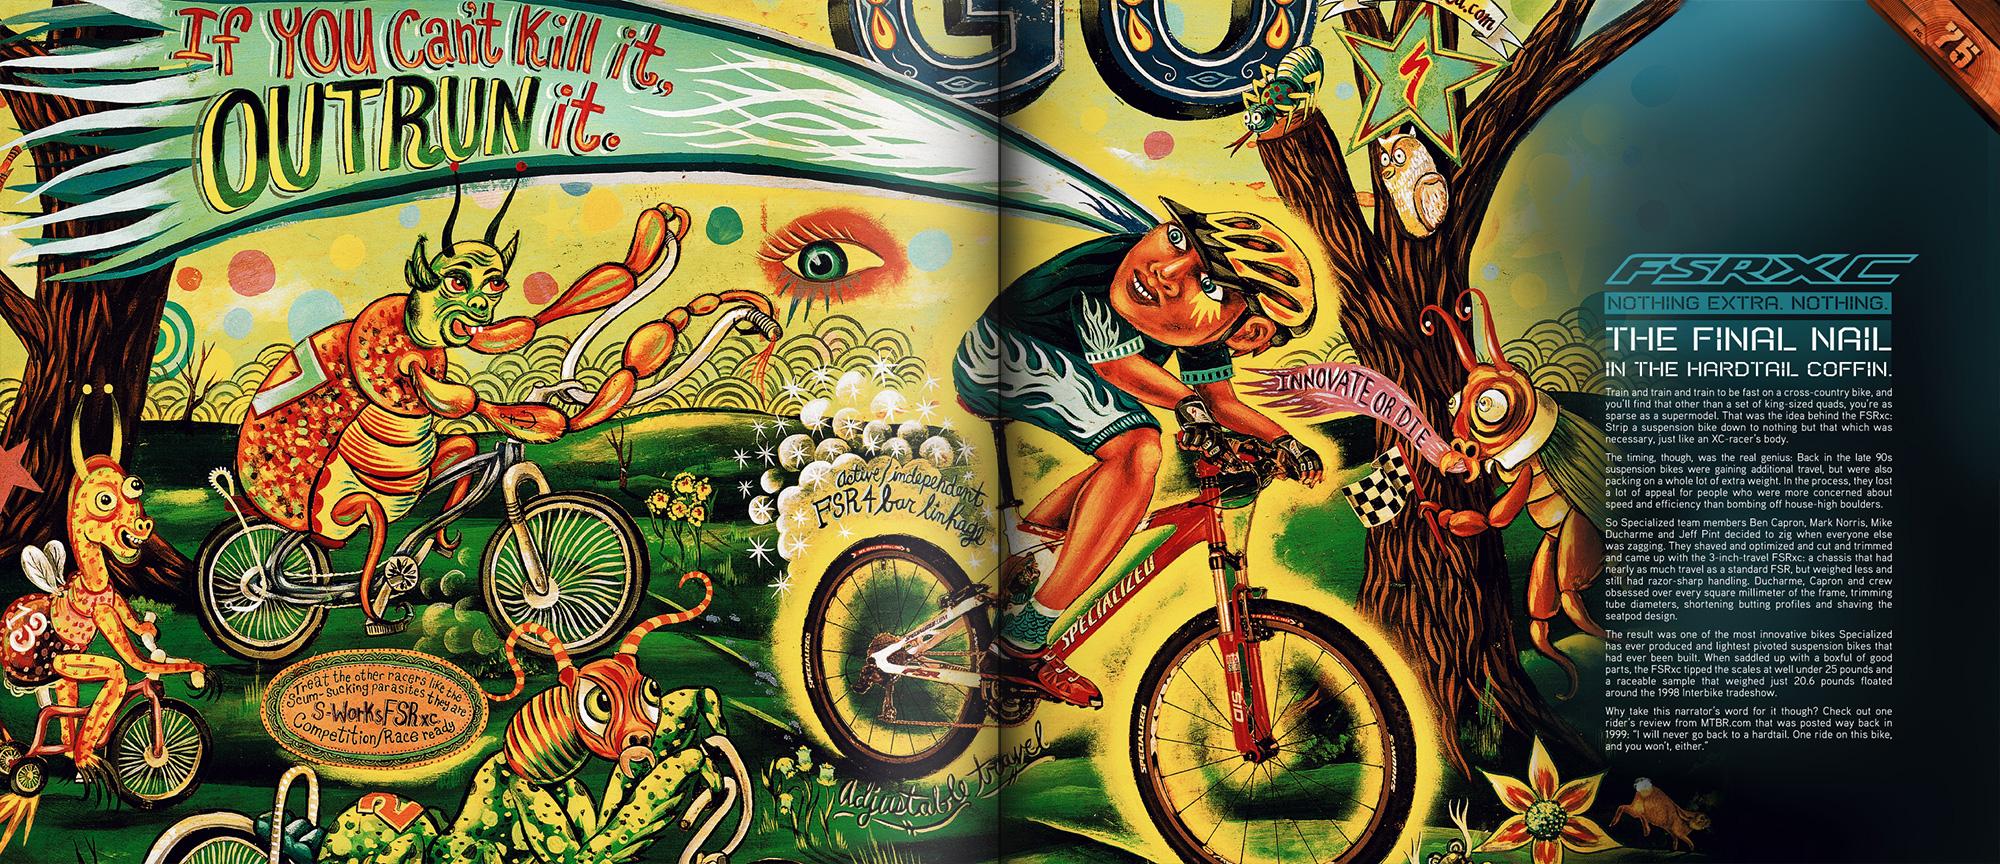 Stunt jumper anniversary book depicting psychedelic illustration of  stuntjumper in race